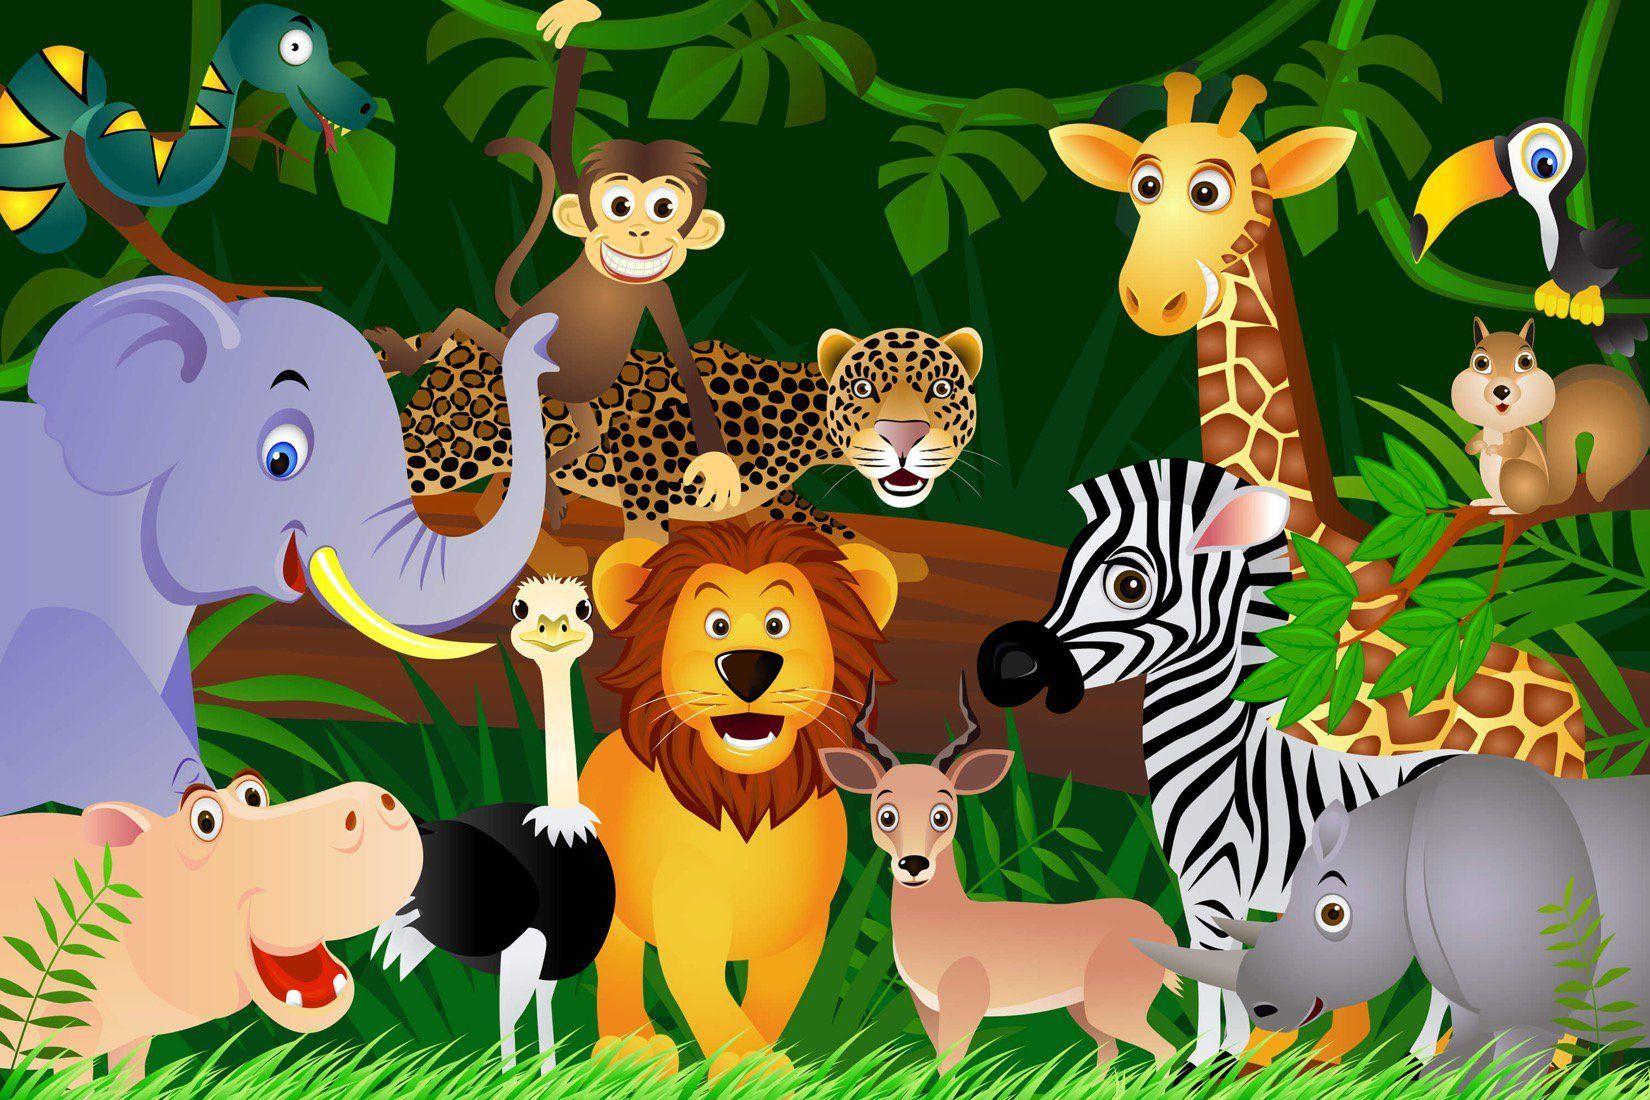 Jungle Animals Wallpapers - Wallpaper Cave